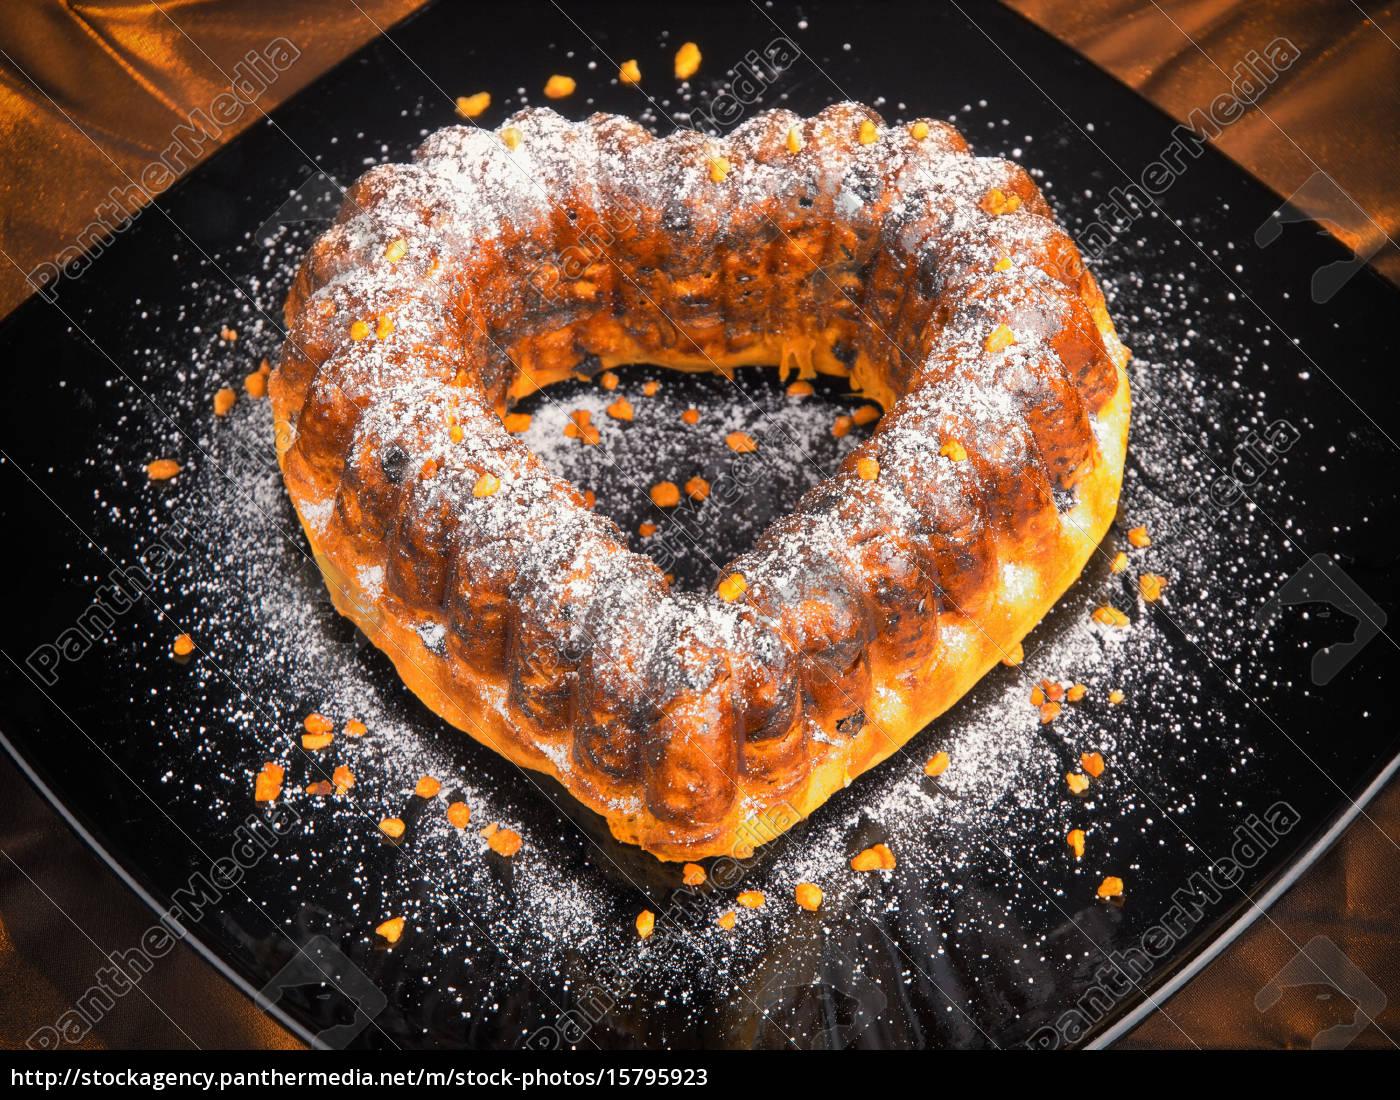 heartshaped, cake, heartshaped, cake, heartshaped, cake, heartshaped, cake - 15795923